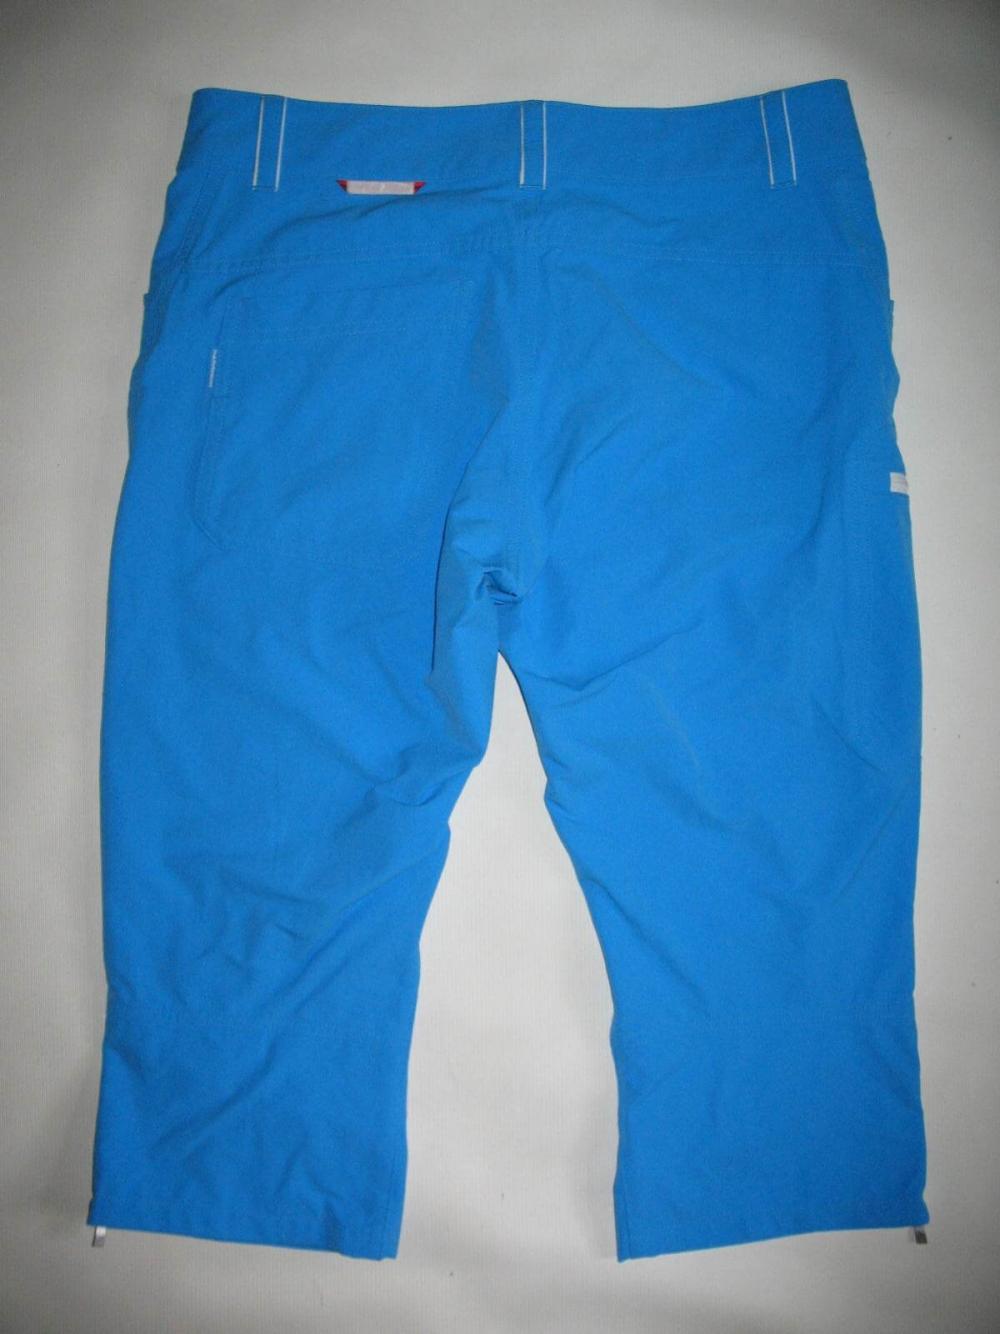 Шорты PEAK PERFOMANCE agile shorts lady (размер M) - 2